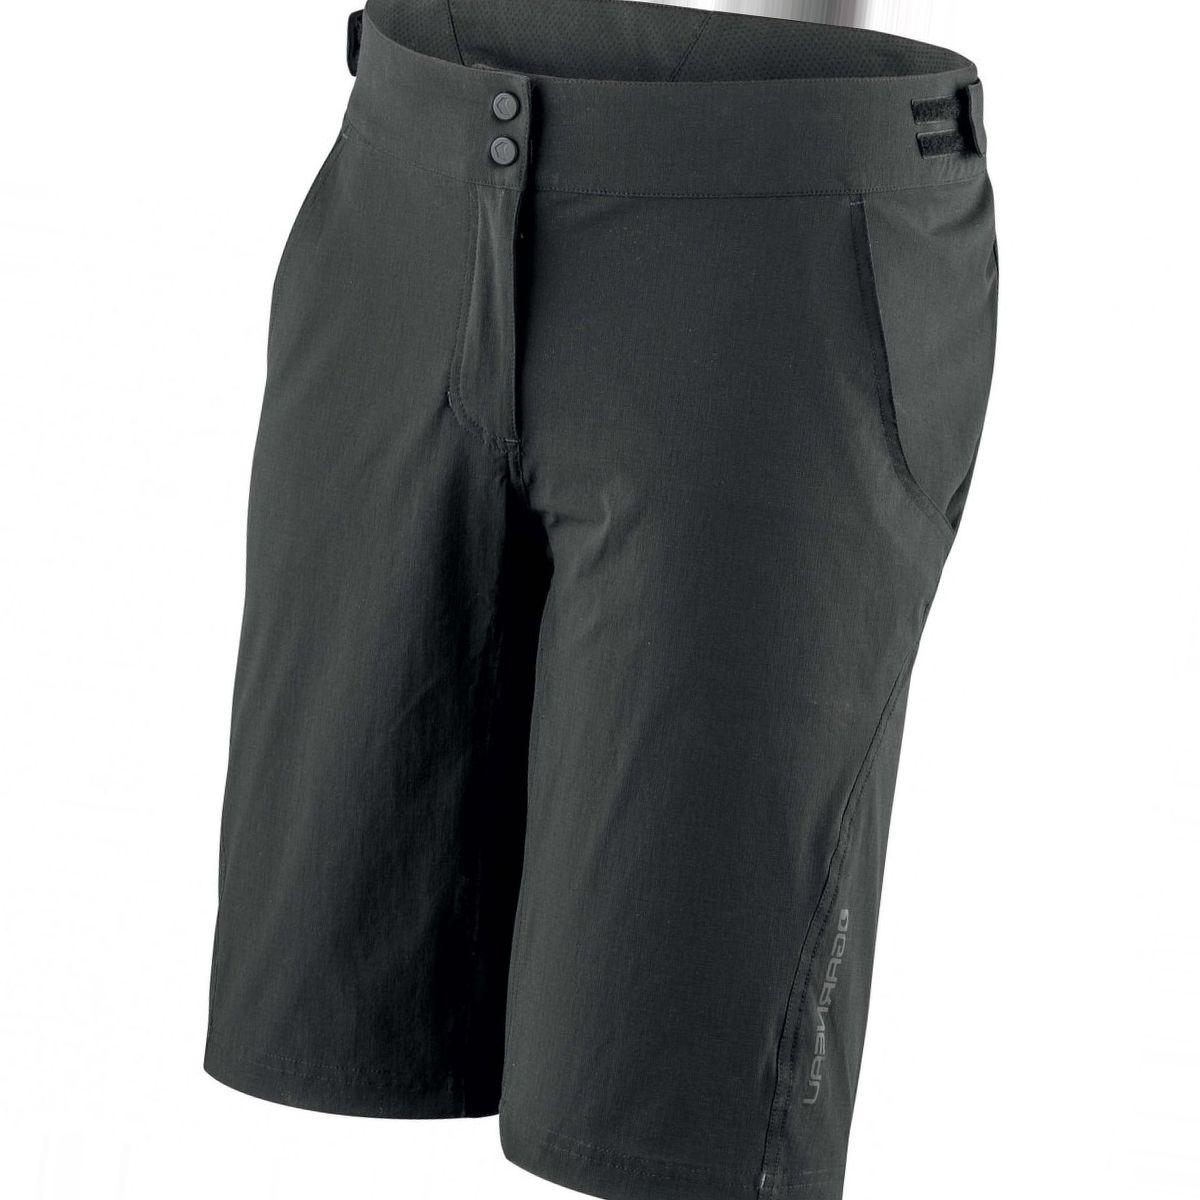 Louis Garneau Connector Short - Men's